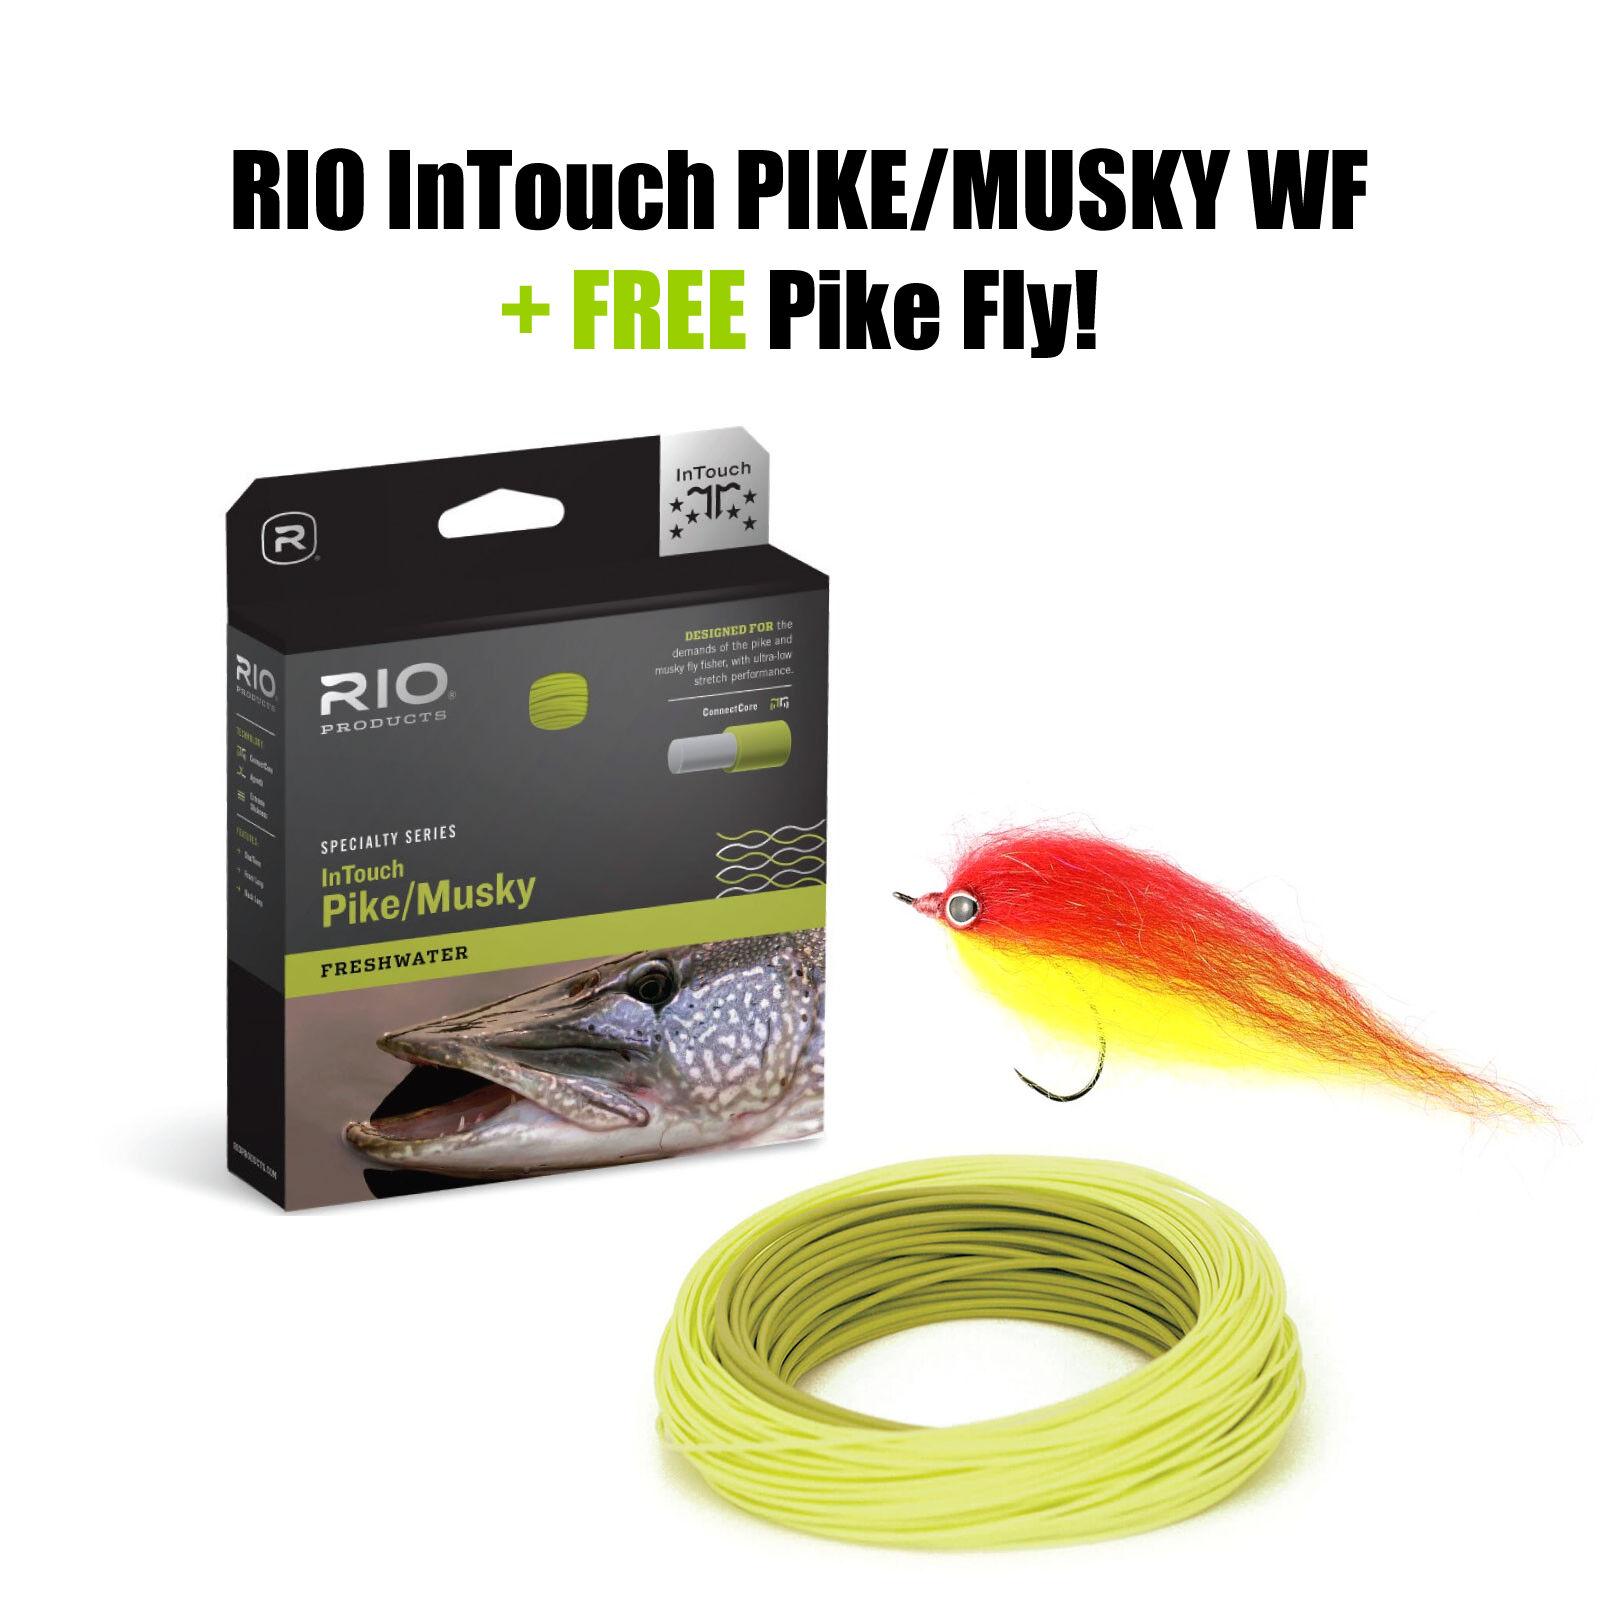 Río Intouch Pike musky Fly Line wf8f-moscas cuerda + Free  Pike fly     barato en alta calidad